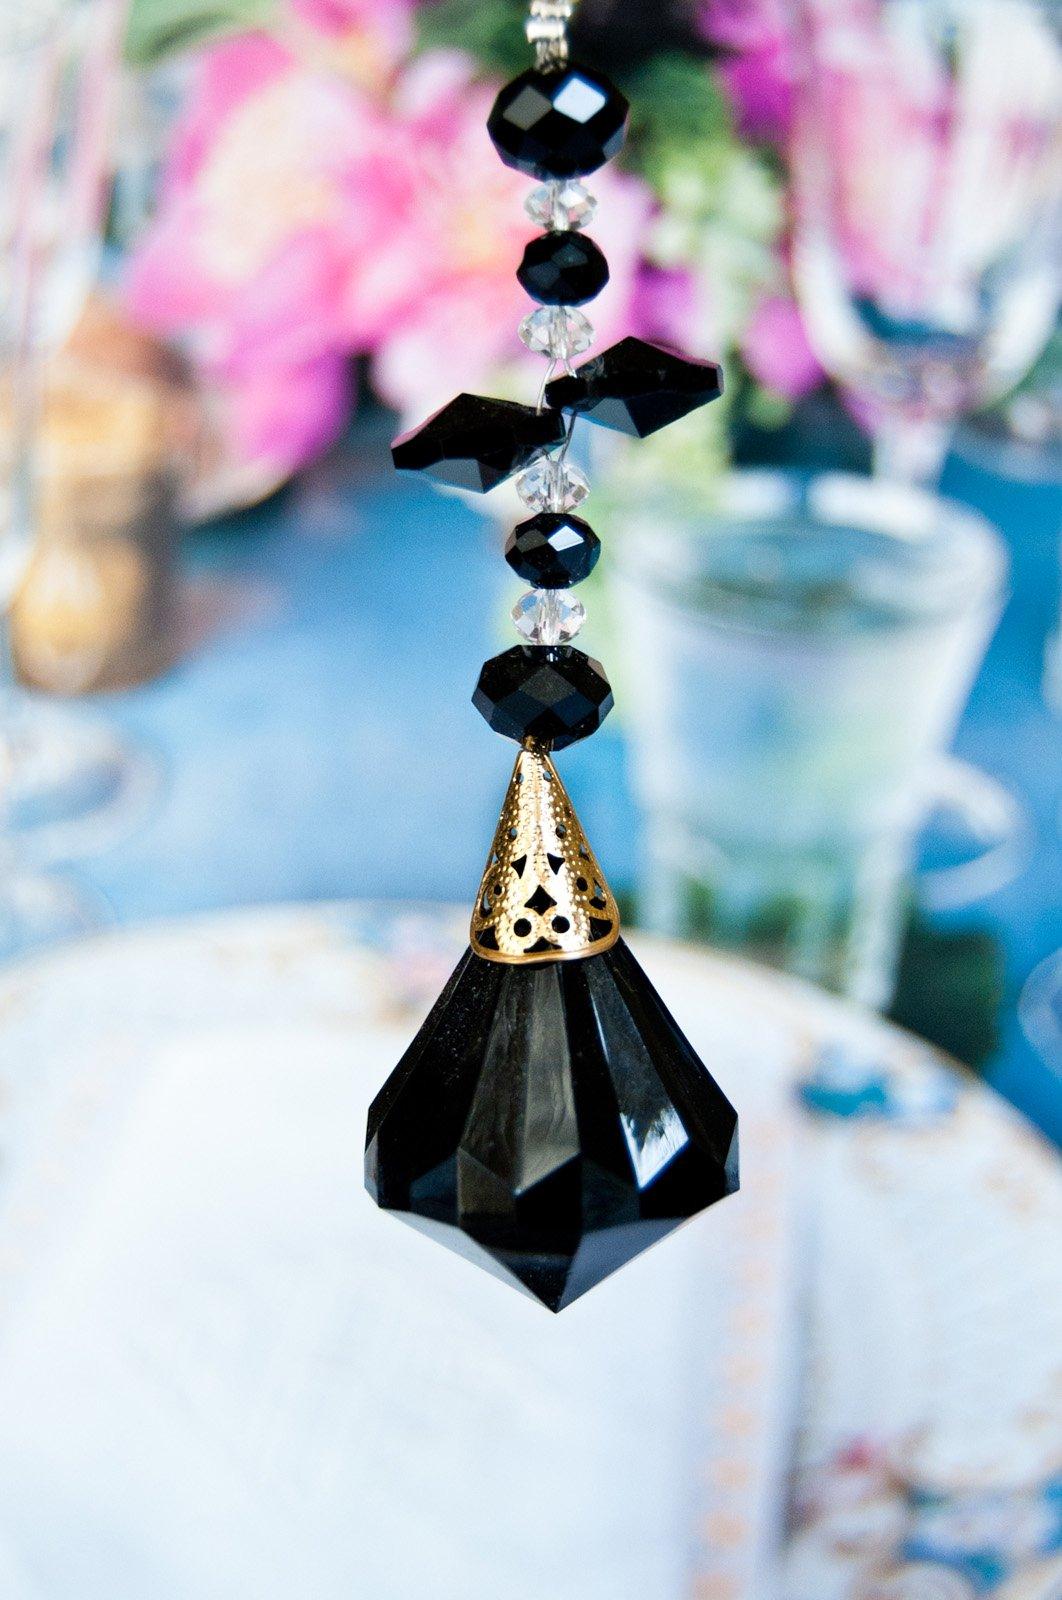 2 of Crystal Diamond Ceiling Lighting Fan Pulls Chain - Black